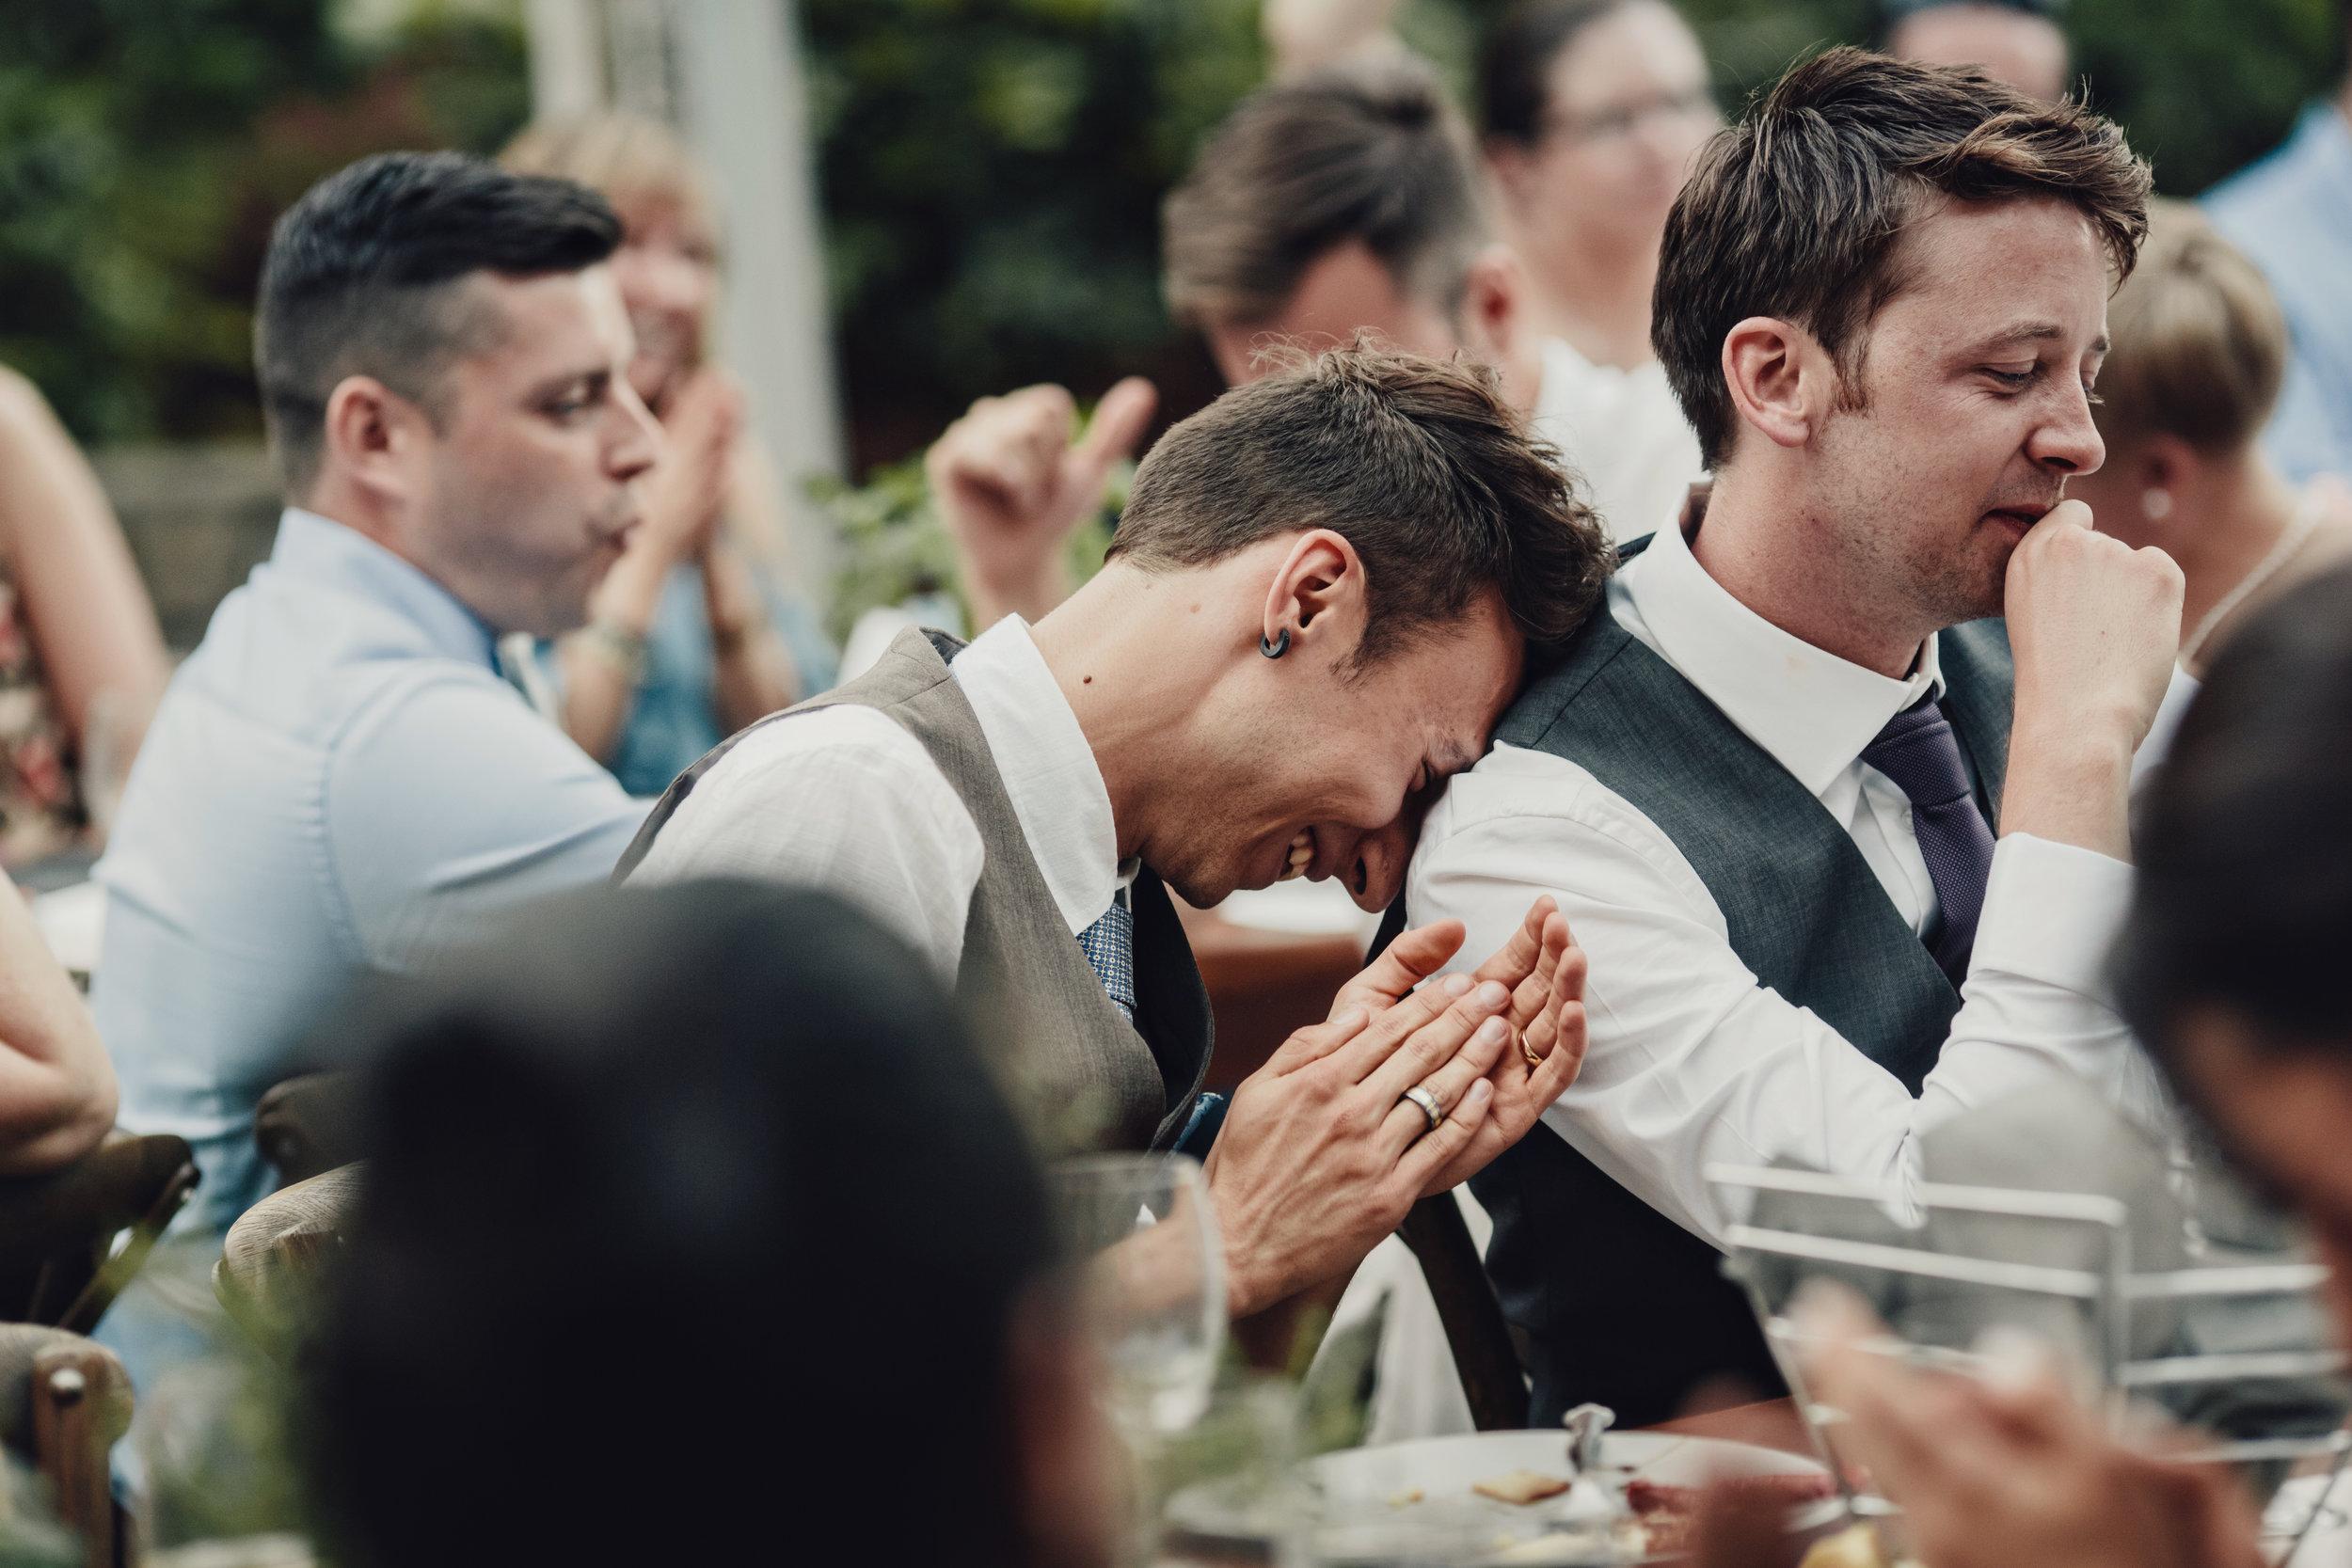 same-sex-wedding-photos-34.jpg